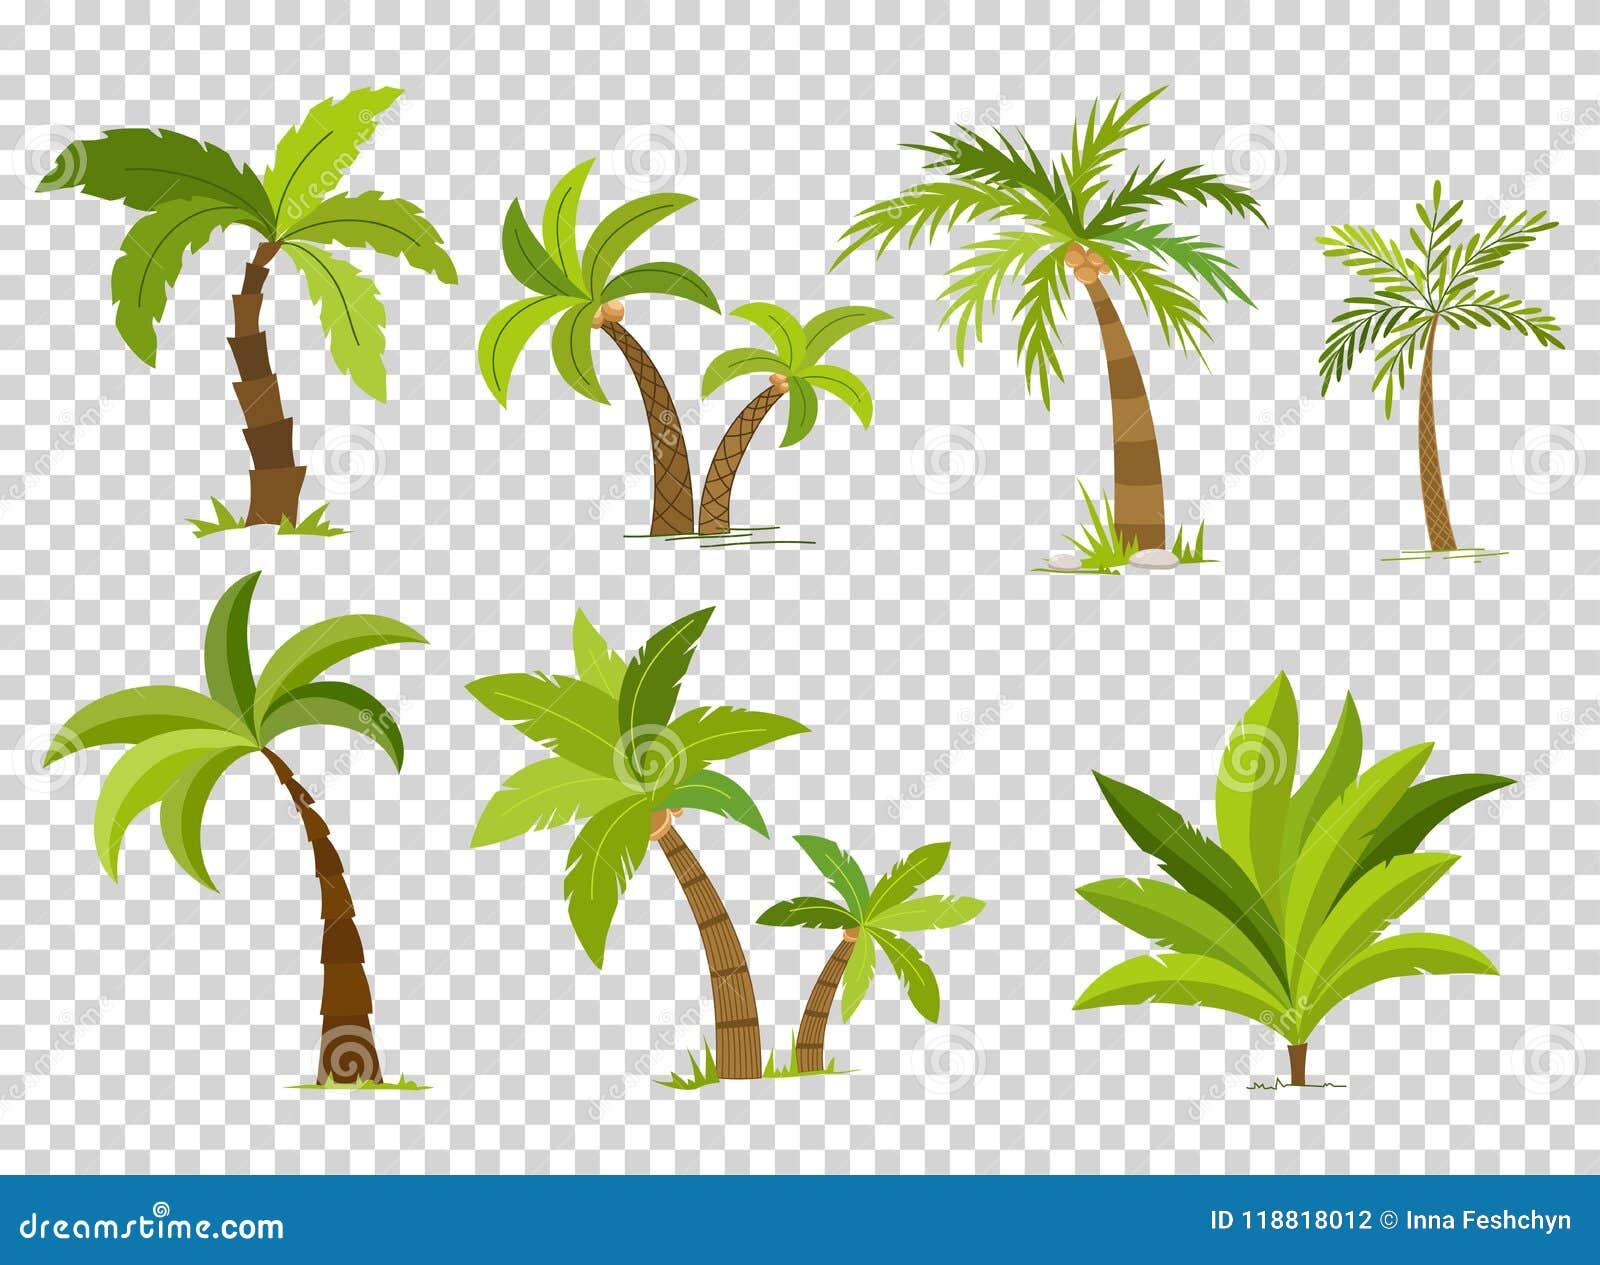 Palm trees isolated on transparent background. Beautiful vectro palma tree set vector illustration